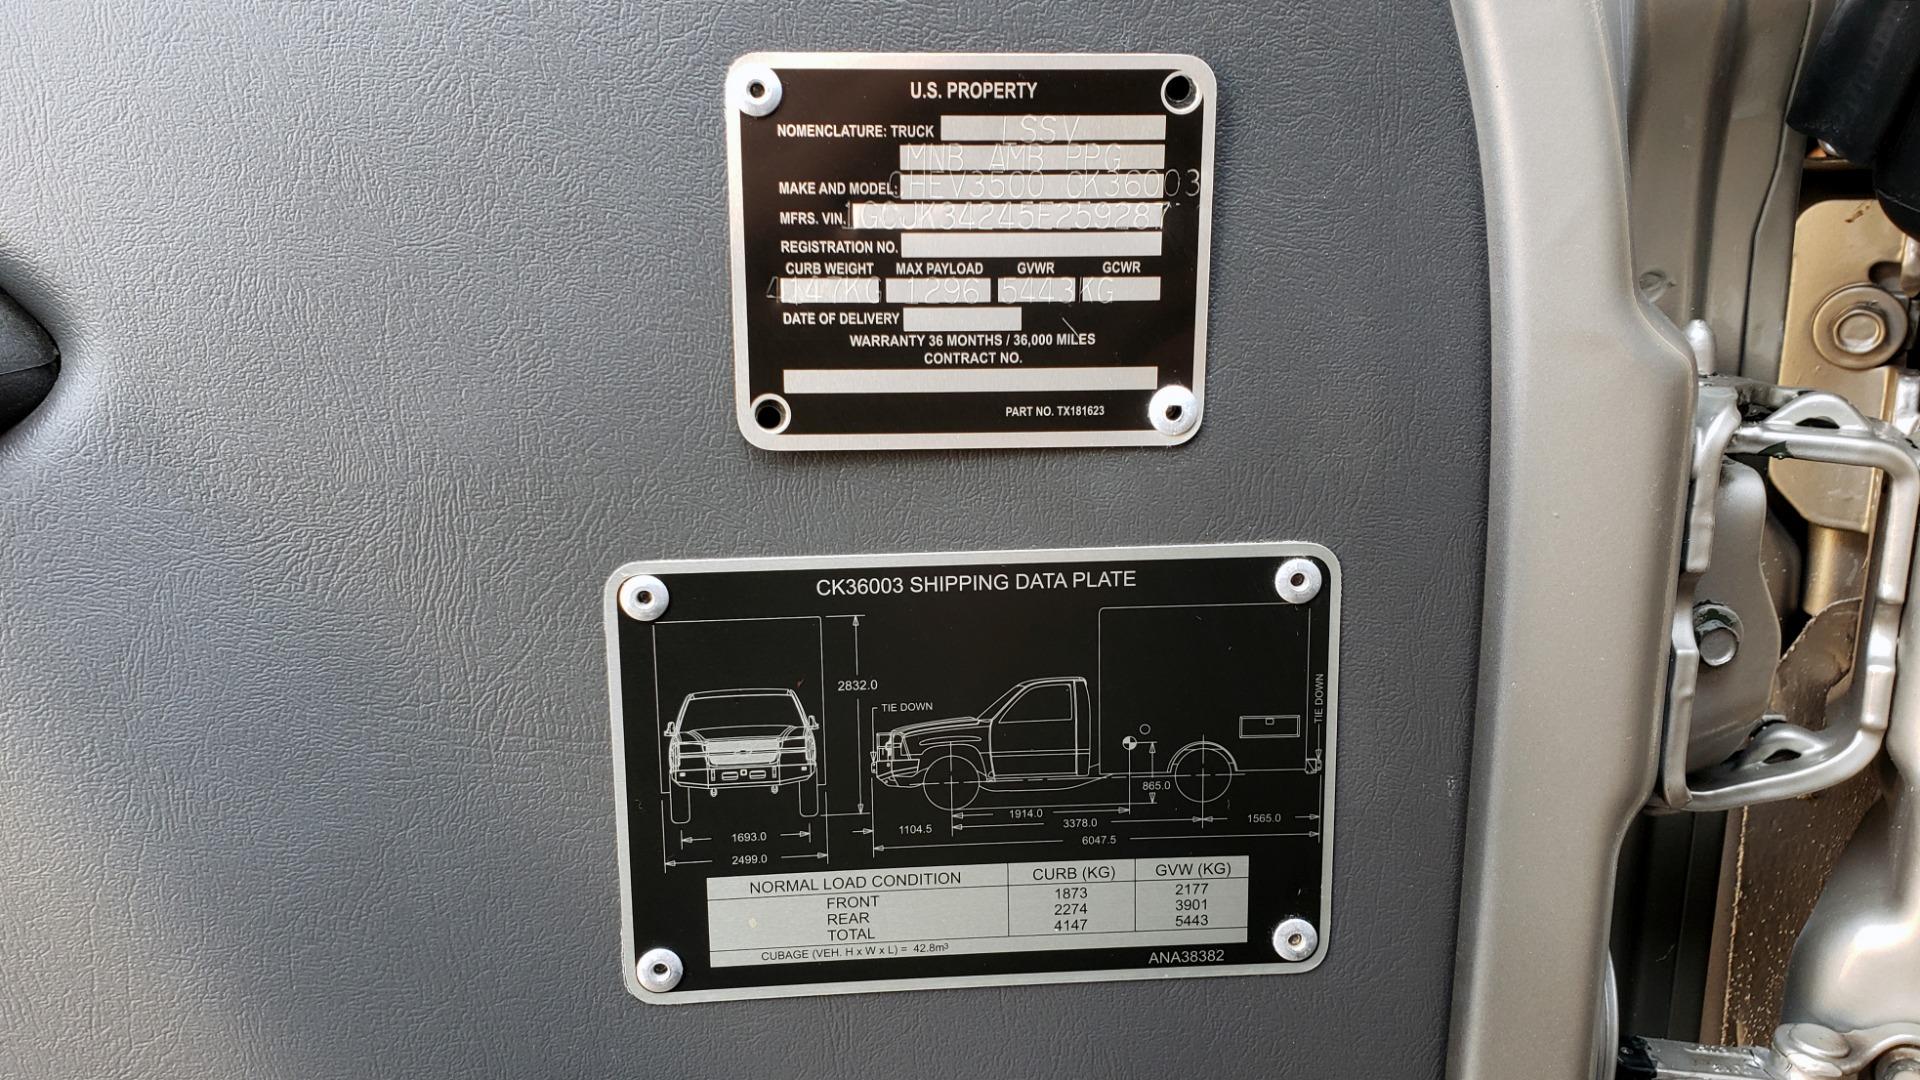 Used 2005 Chevrolet SILVERADO 3500 DRW / 4WD / REG CAB / 6.6L DURAMAX / DOOMSDAY PREPPER for sale $21,499 at Formula Imports in Charlotte NC 28227 10